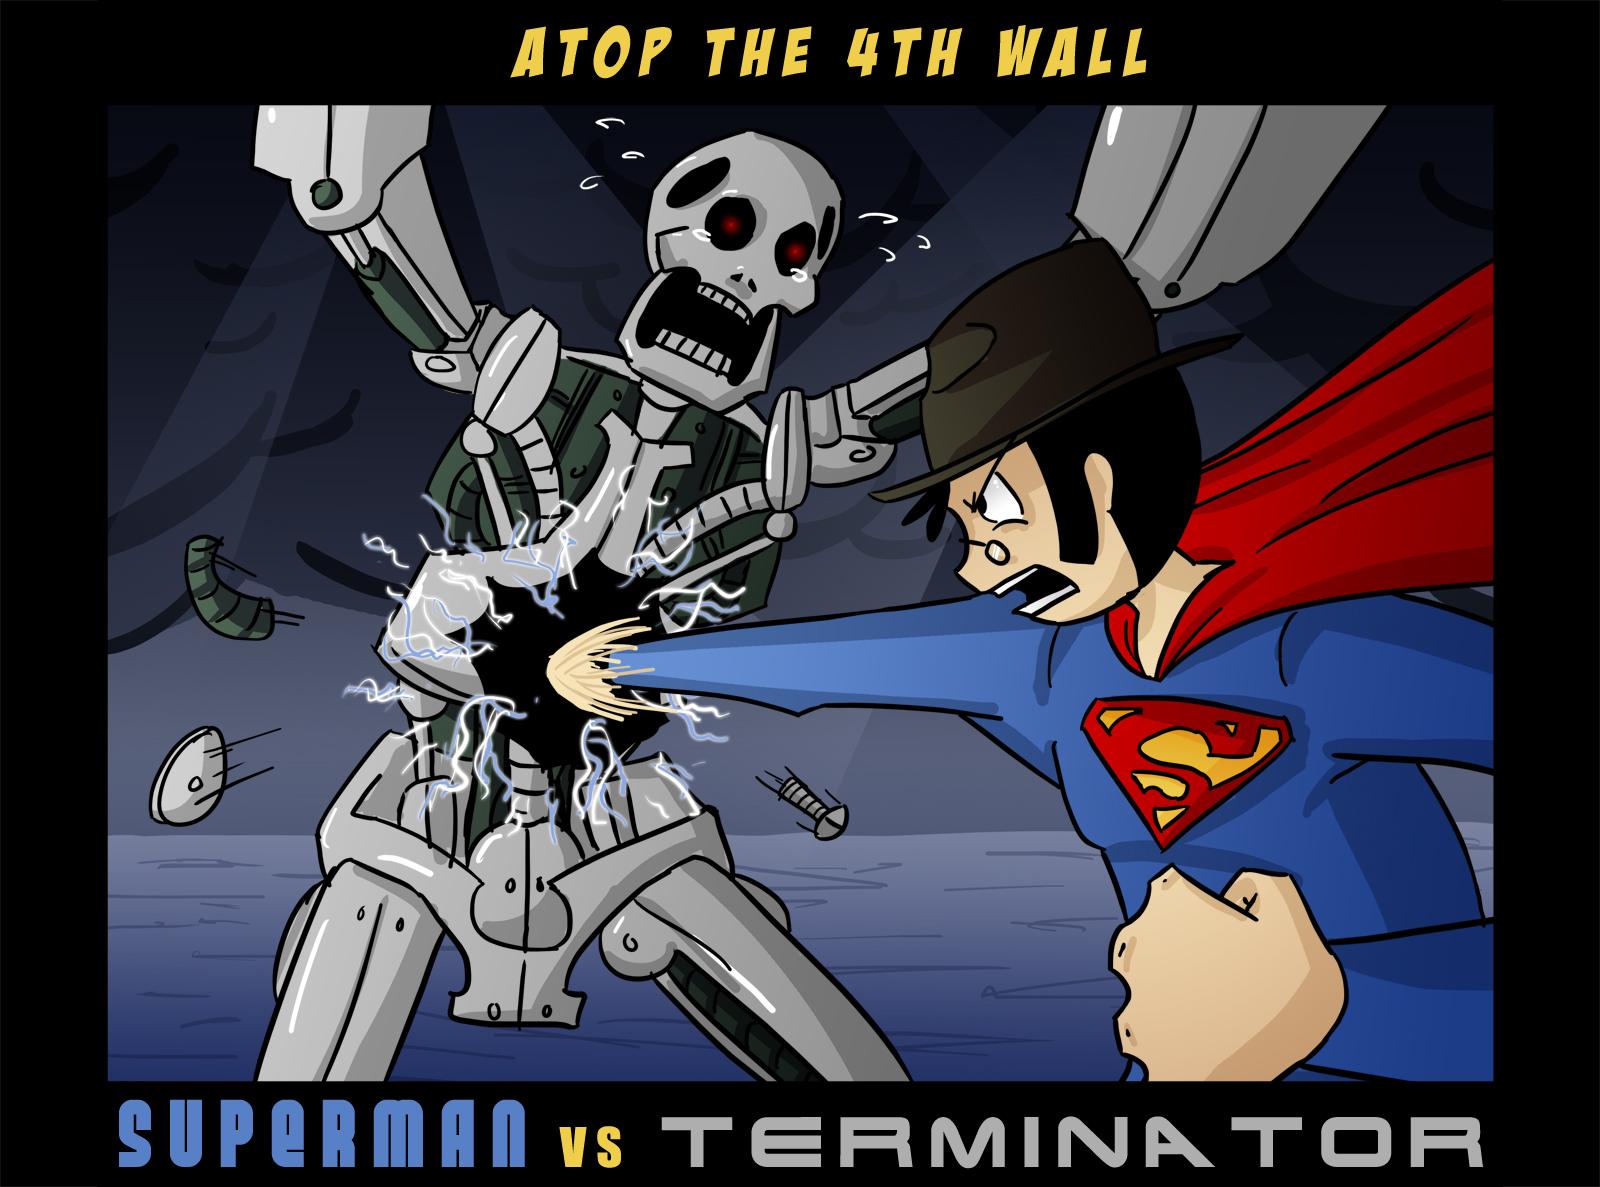 Superman vs Terminator 1